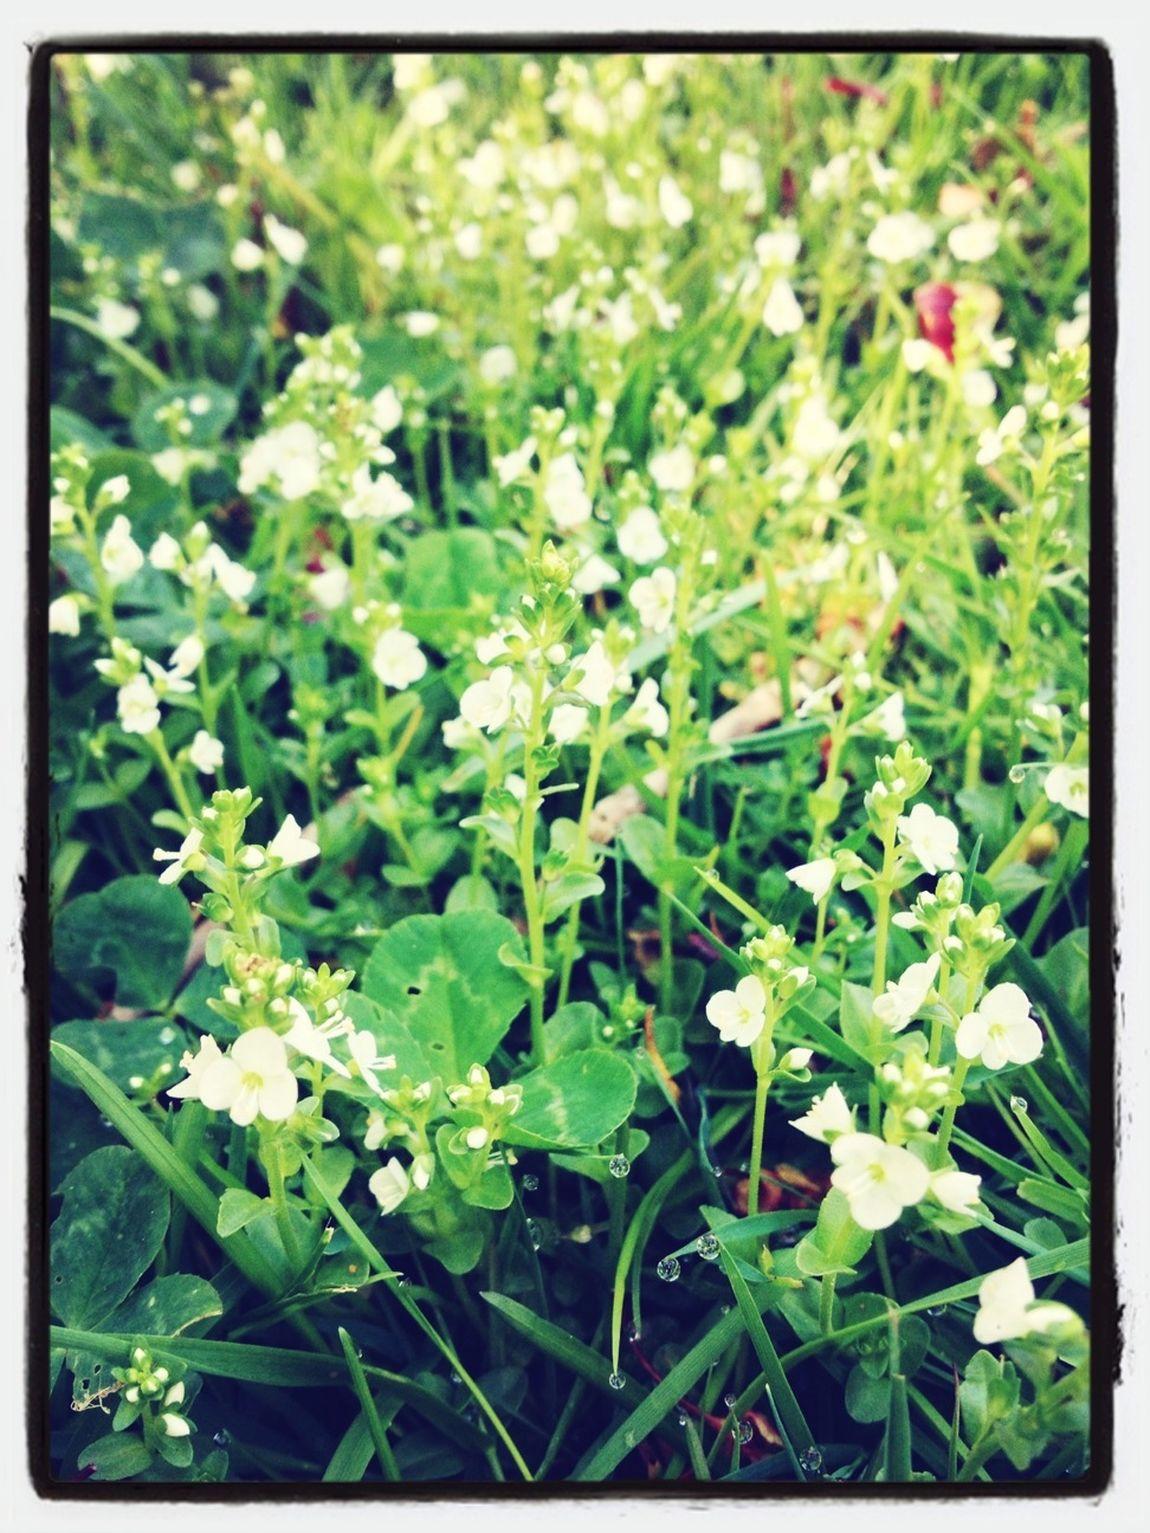 Flowers,Plants & Garden